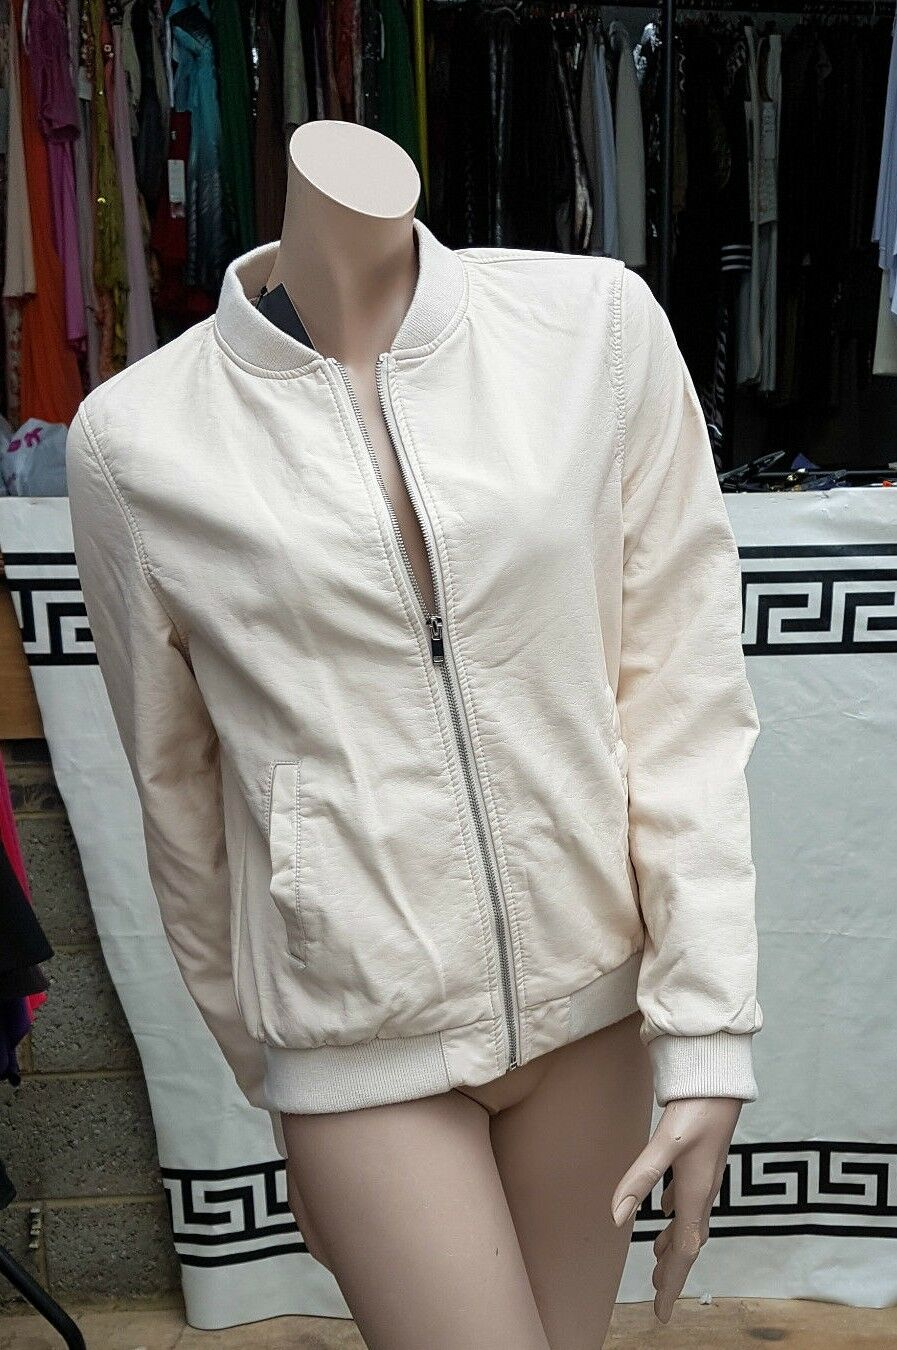 BNWT Atmosphere UK 14 Smart Cream Nude Faux Leather Zip Jacket Blazer Coat